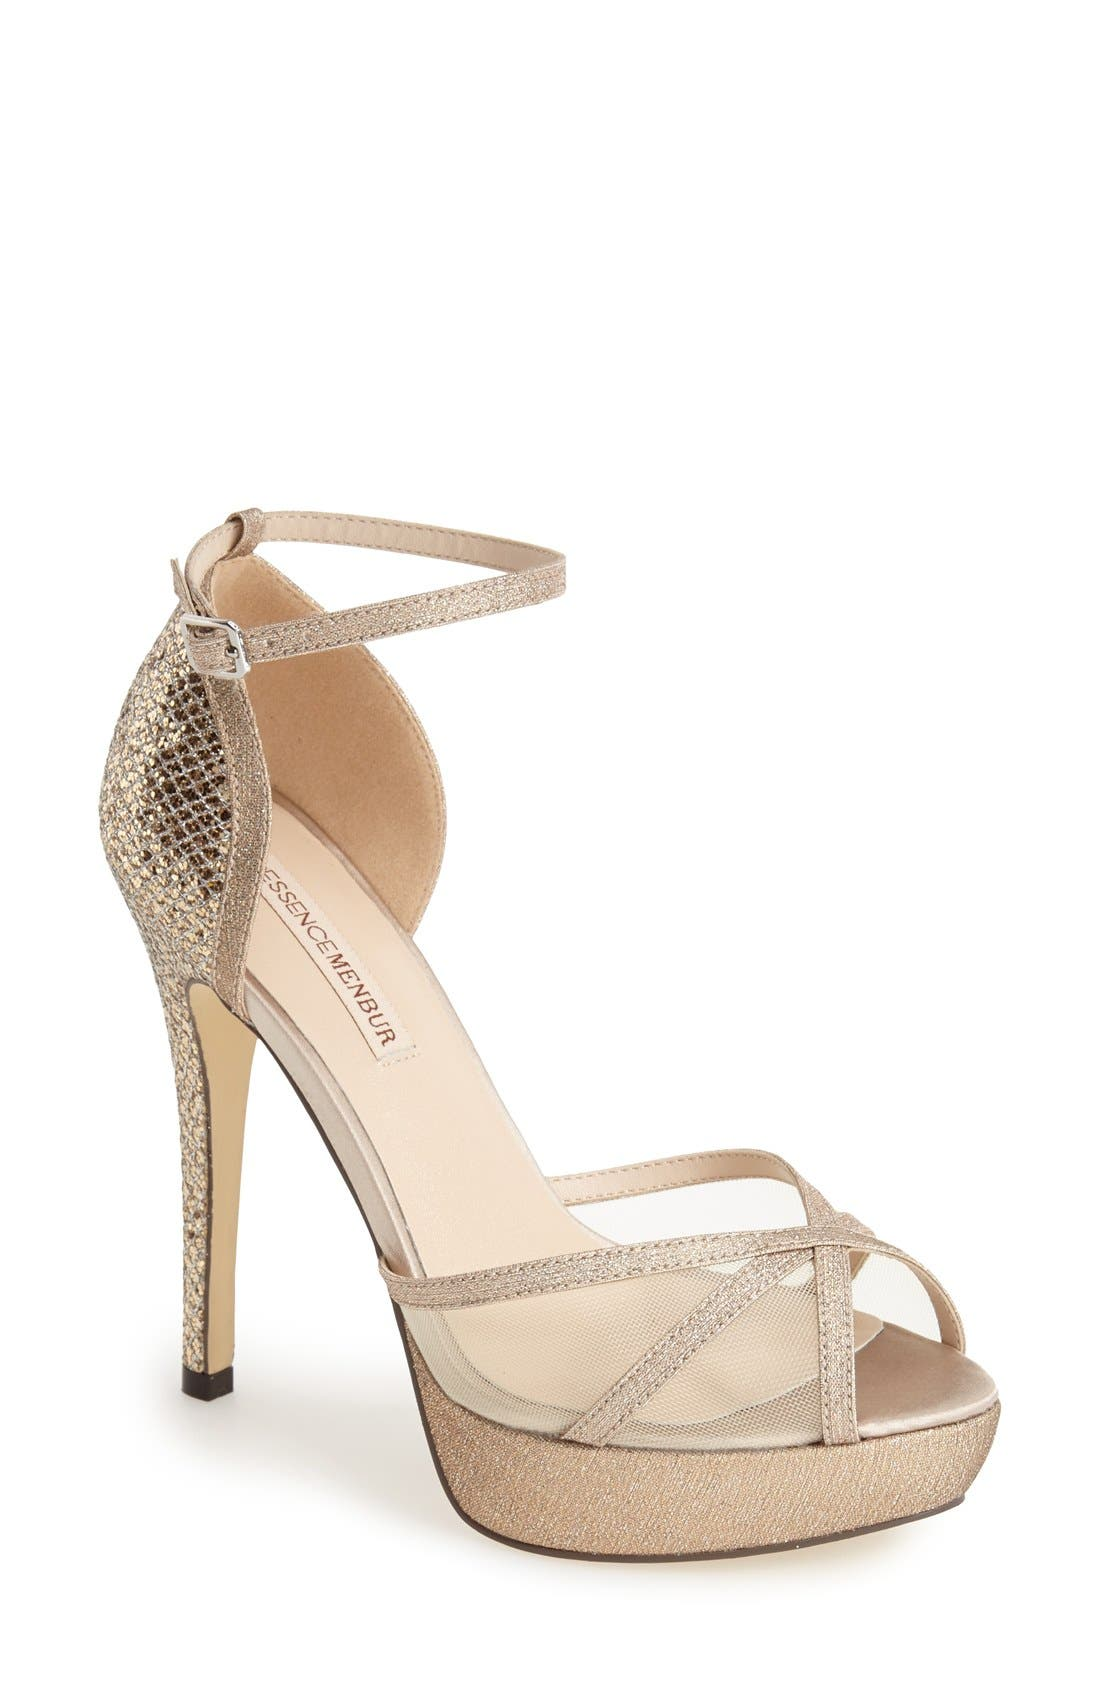 Main Image - Menbur 'Anora' Ankle Strap Platform Sandal (Women)